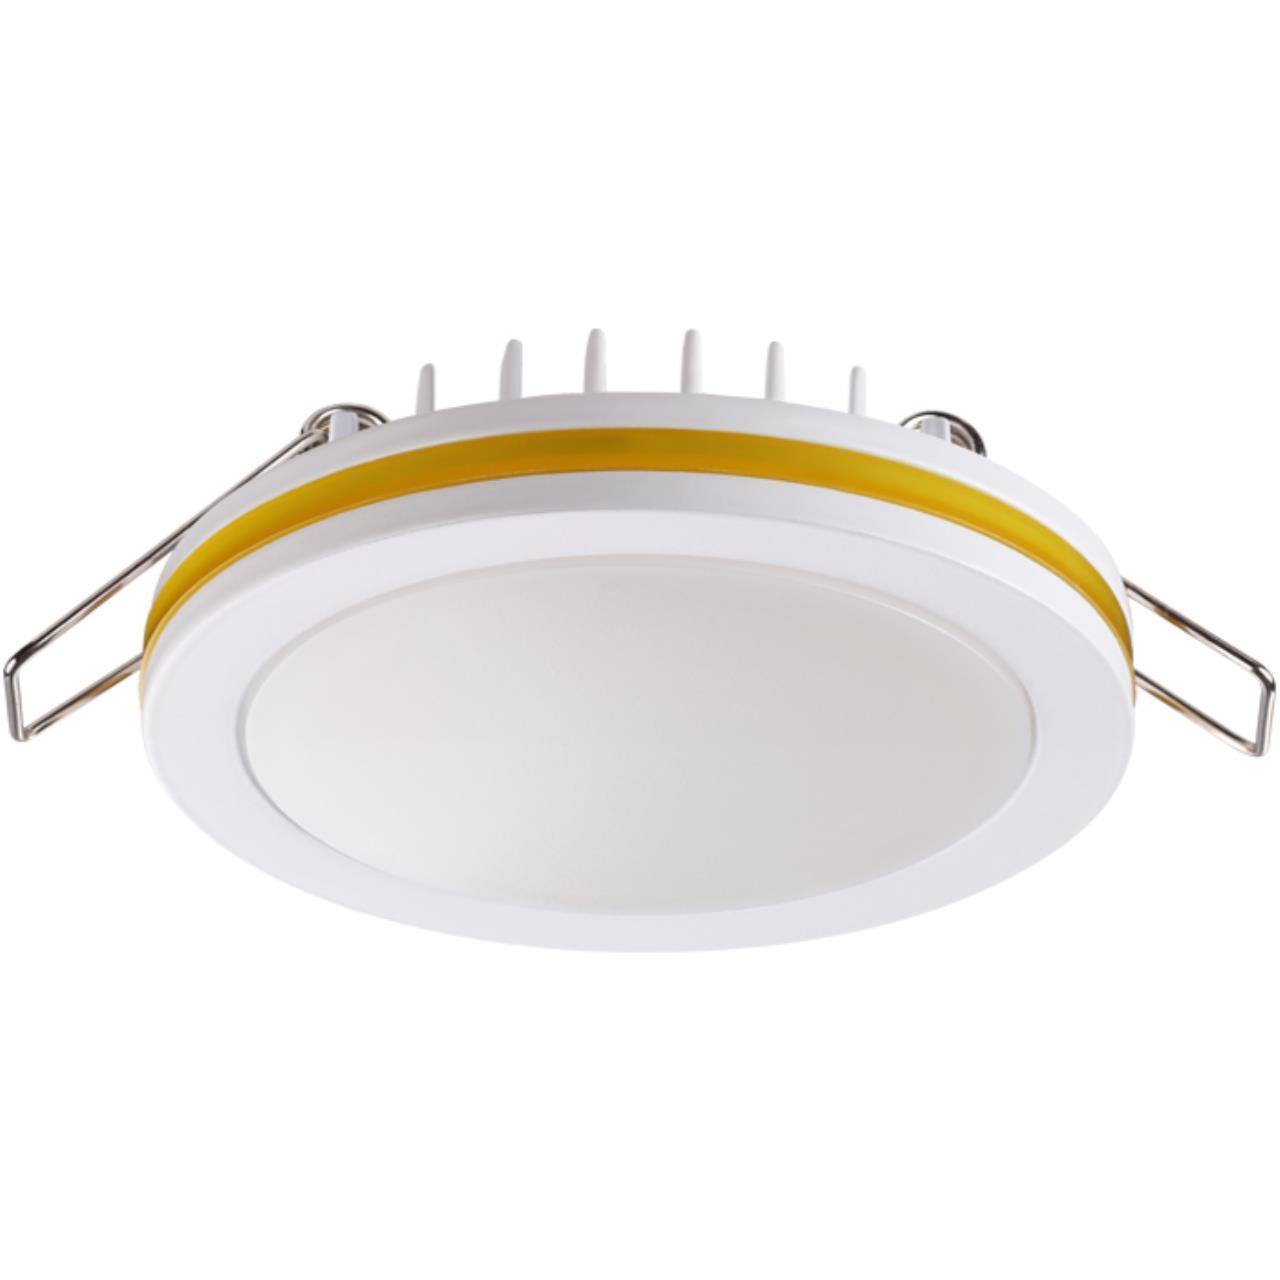 357965 SPOT NT19 080 белый/желтый Встраиваемый светильник IP20 LED 4000К 18W 200-260V KLAR